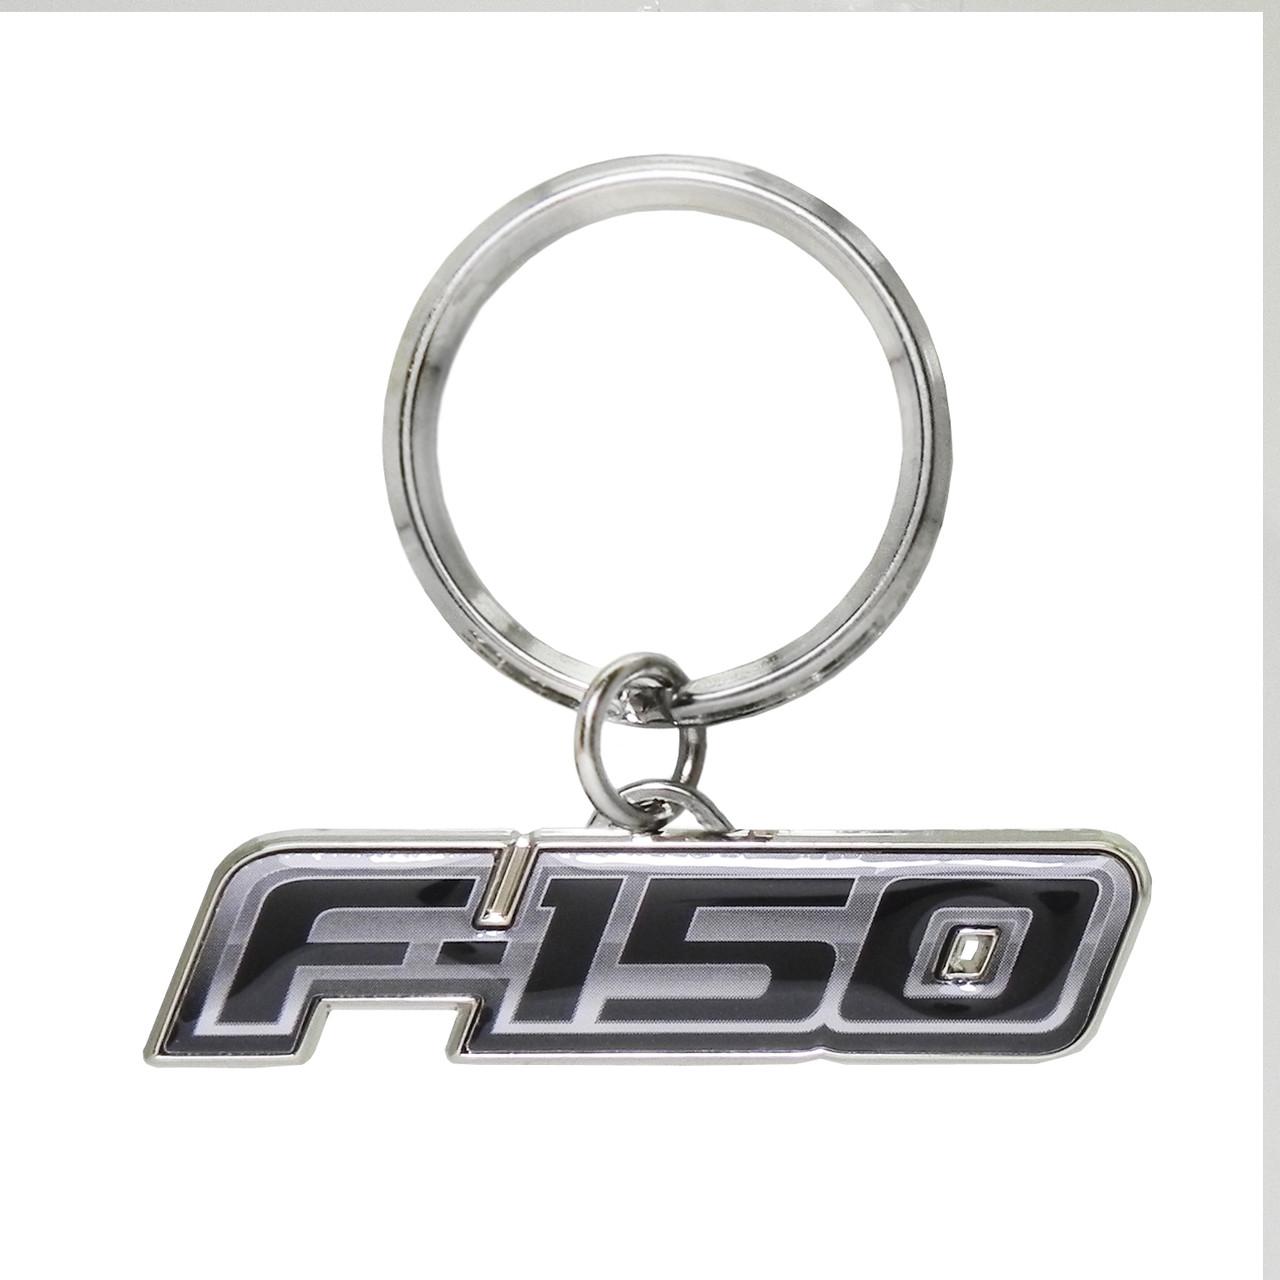 Ford F-150 Raptor Red Spun Brushed Metal Key Chain